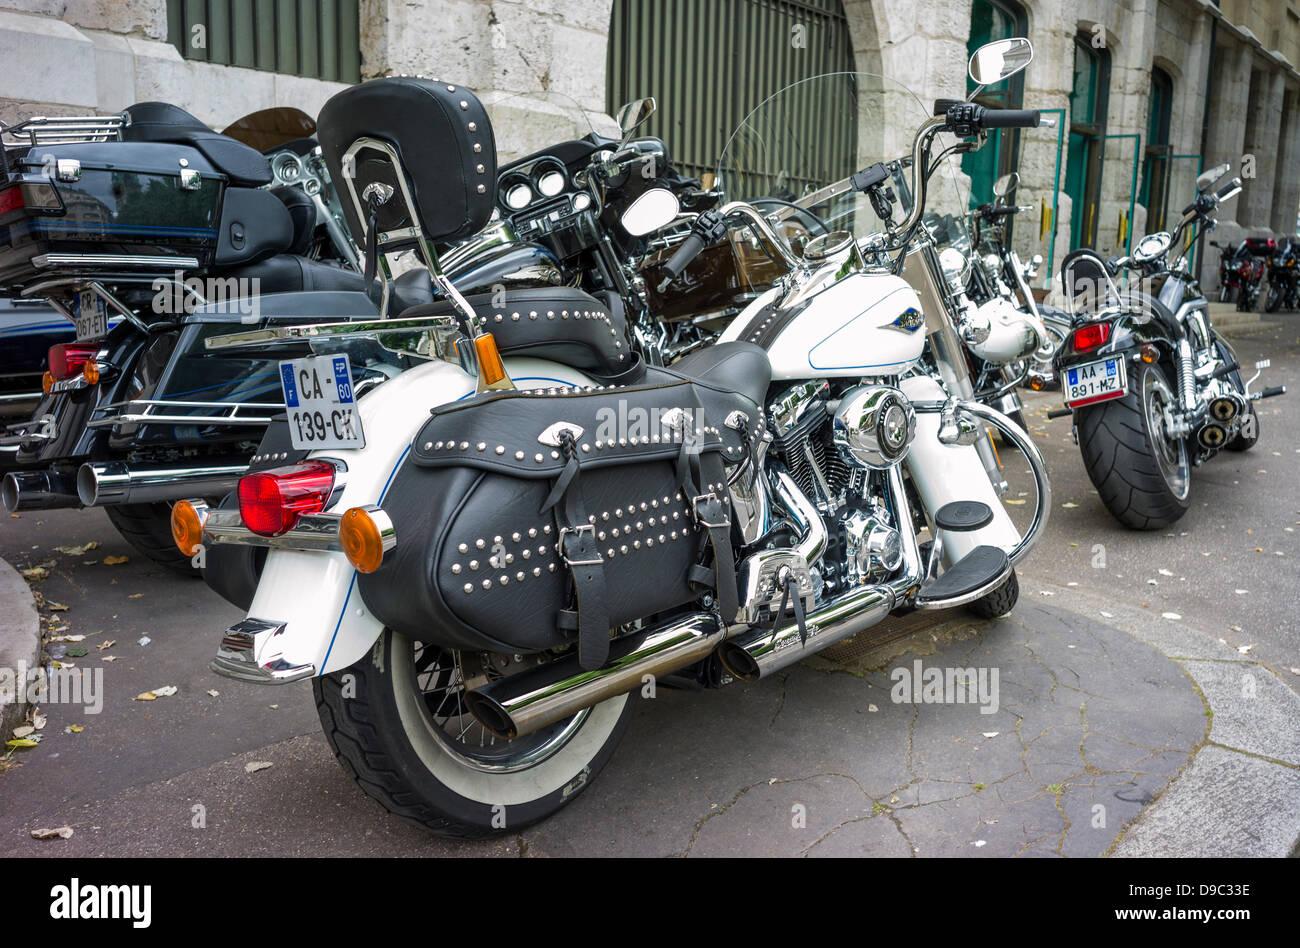 rouen france 15th june 2013 harley davidson bikes on an stock photo royalty free image. Black Bedroom Furniture Sets. Home Design Ideas